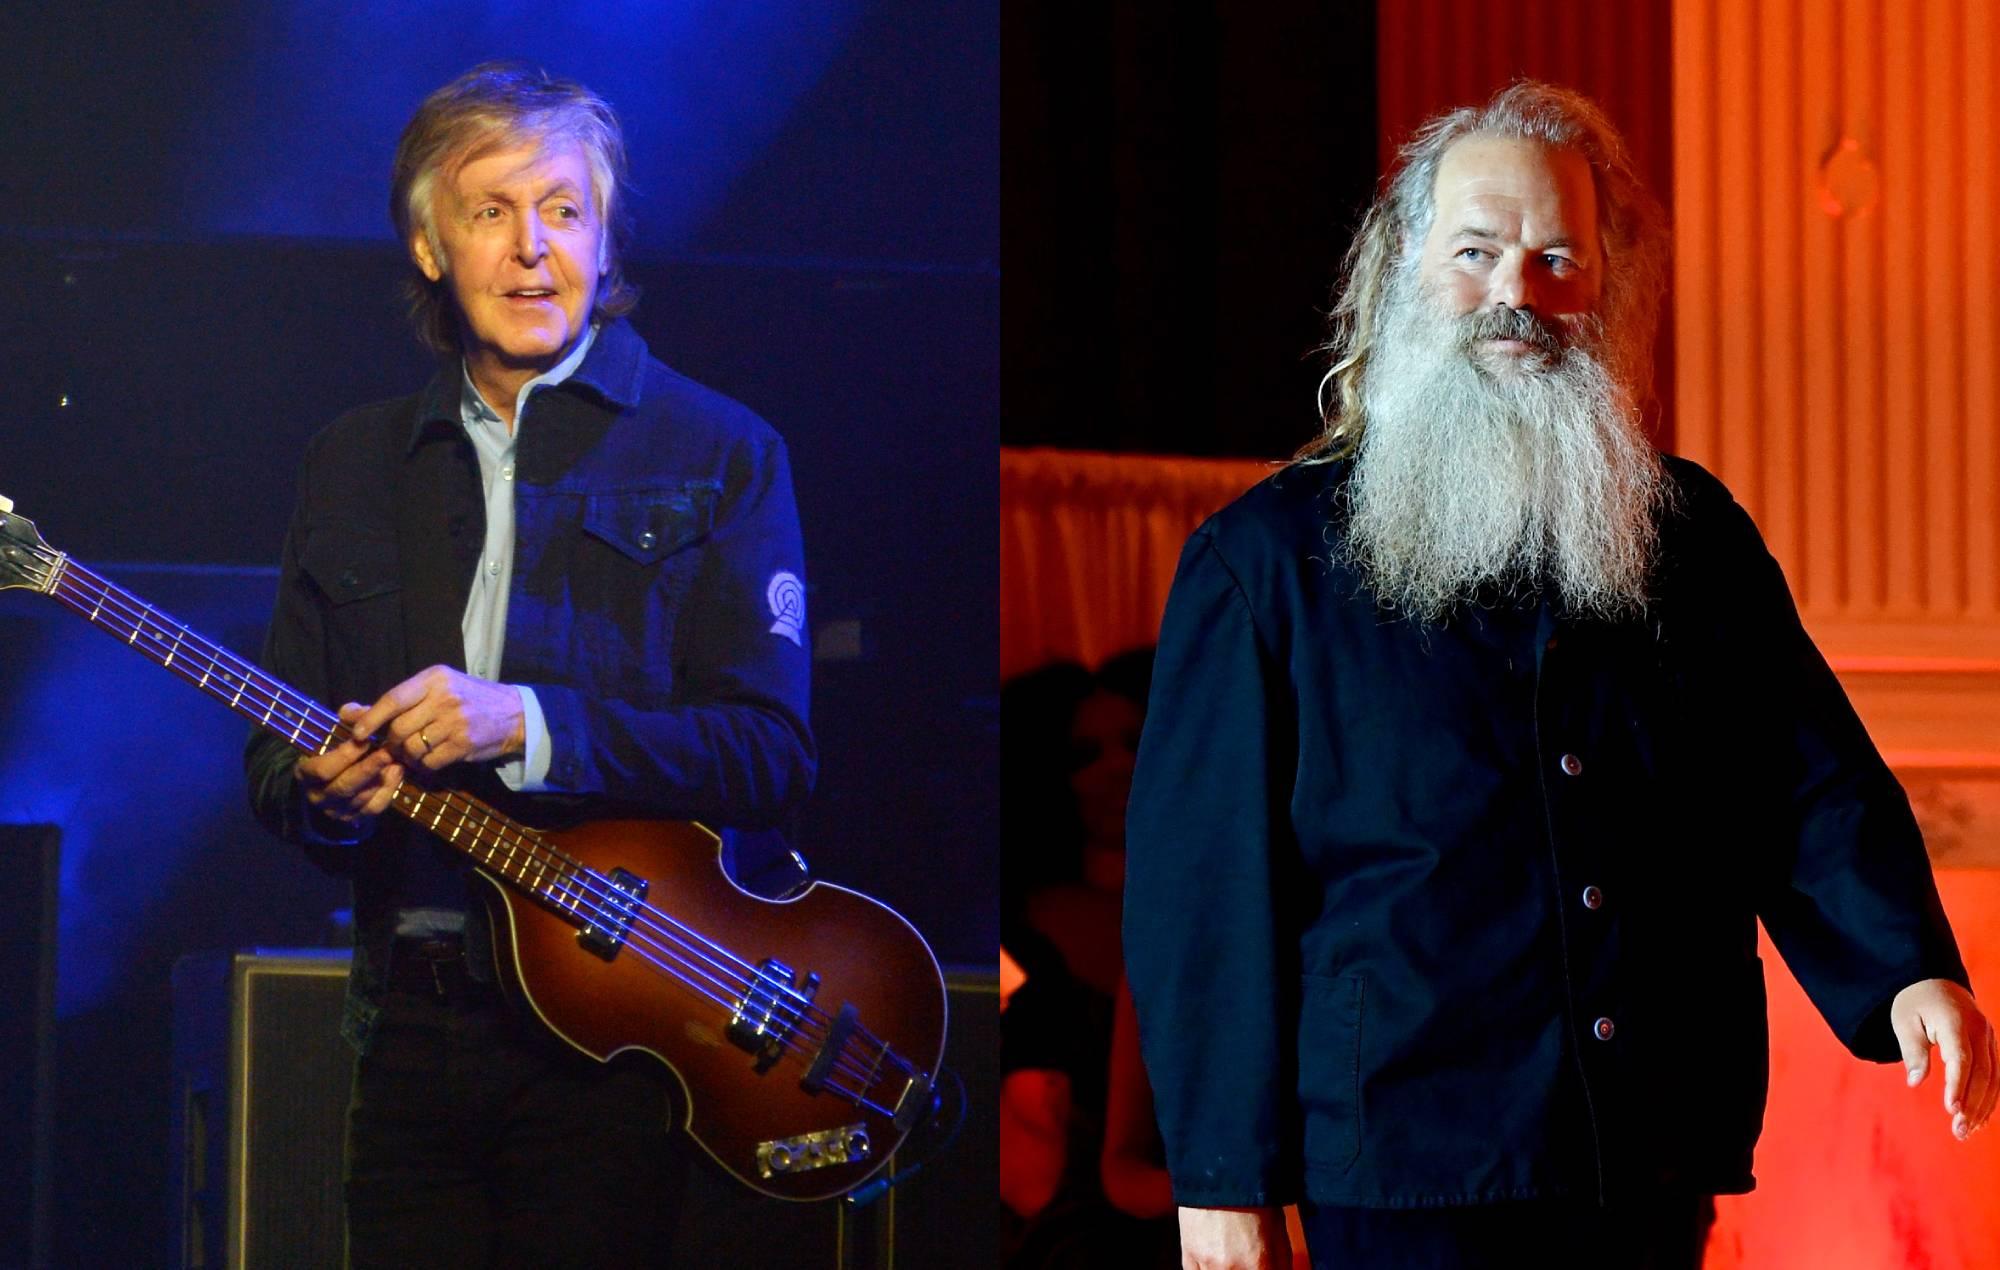 Paul McCartney / Rick Rubin